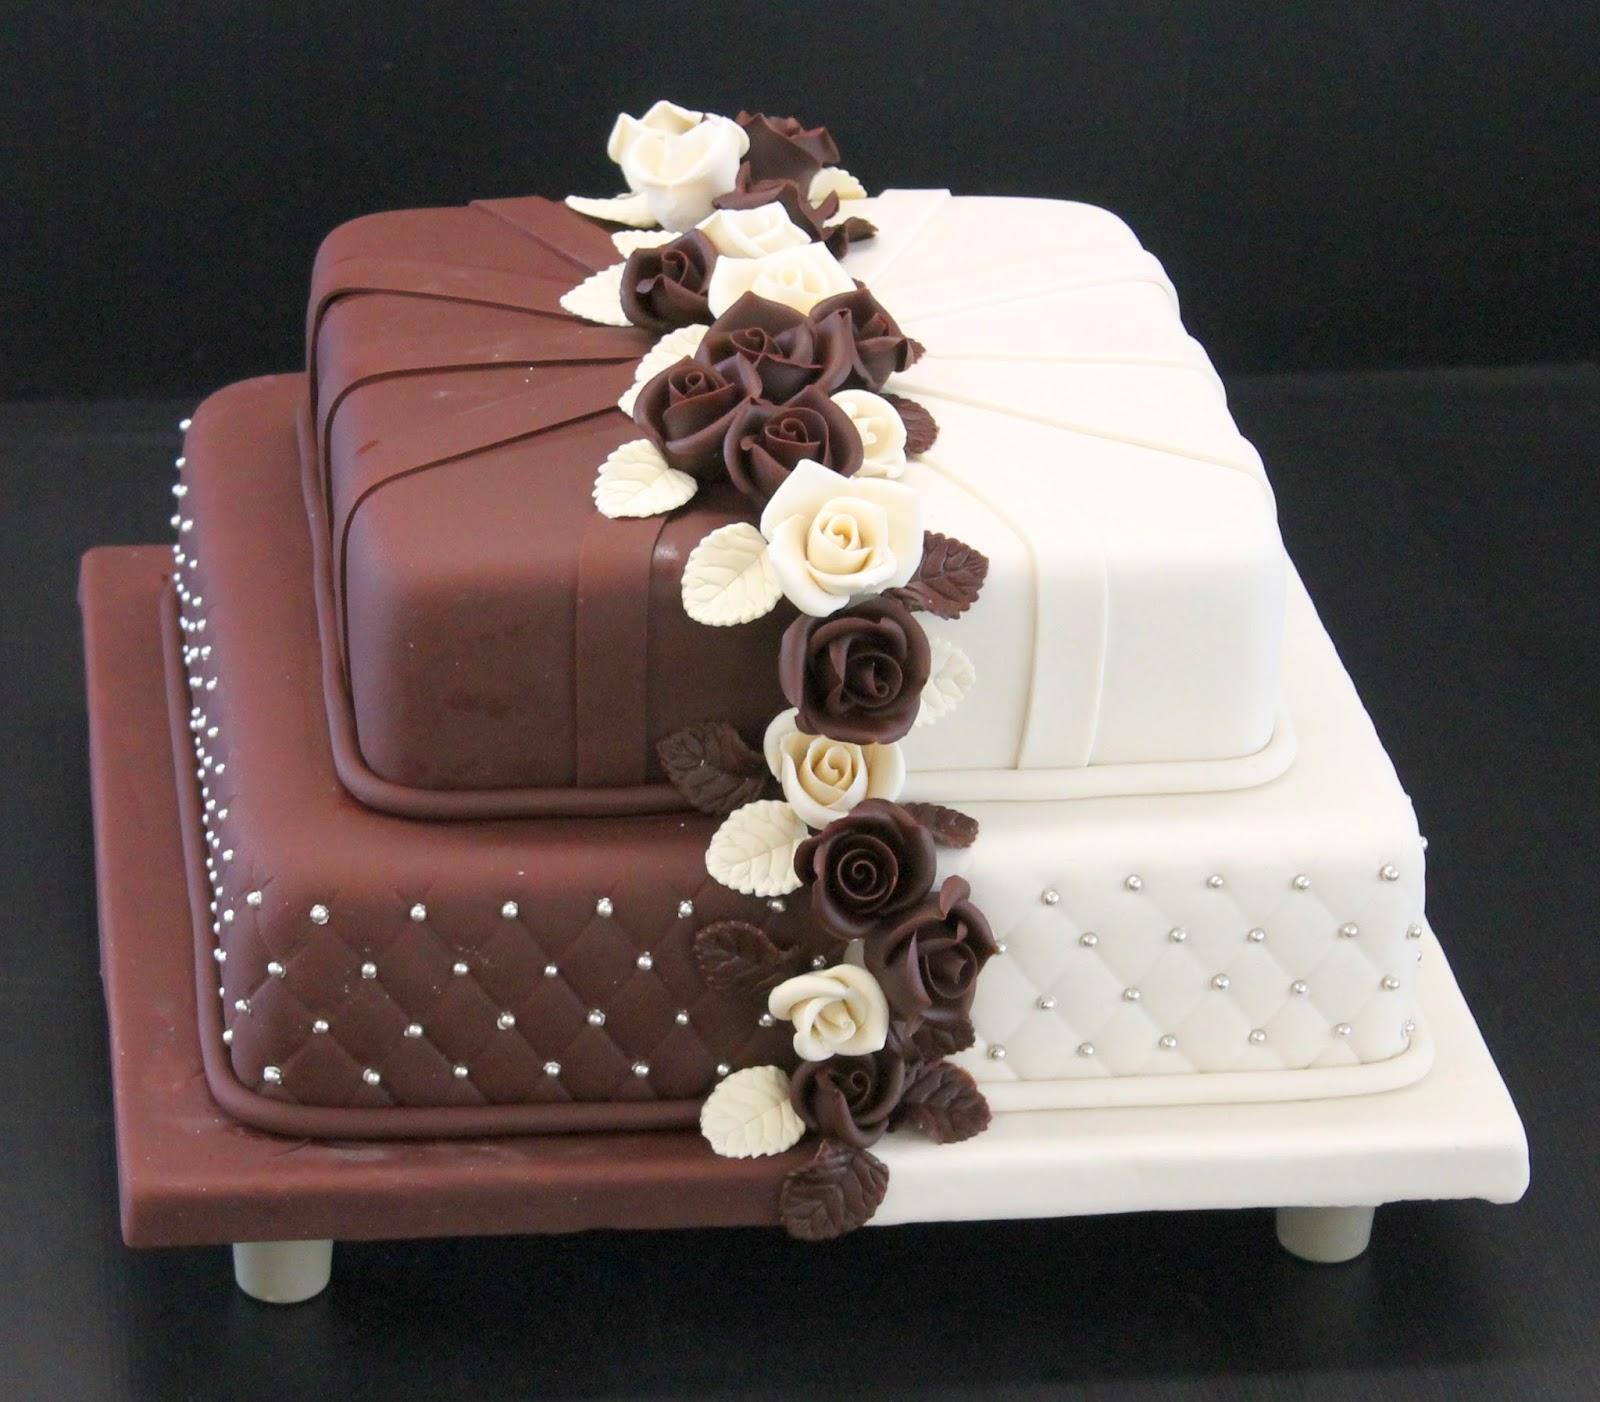 esküvői torta FarkasVilmos: Esküvői torta rendelés esküvői torta